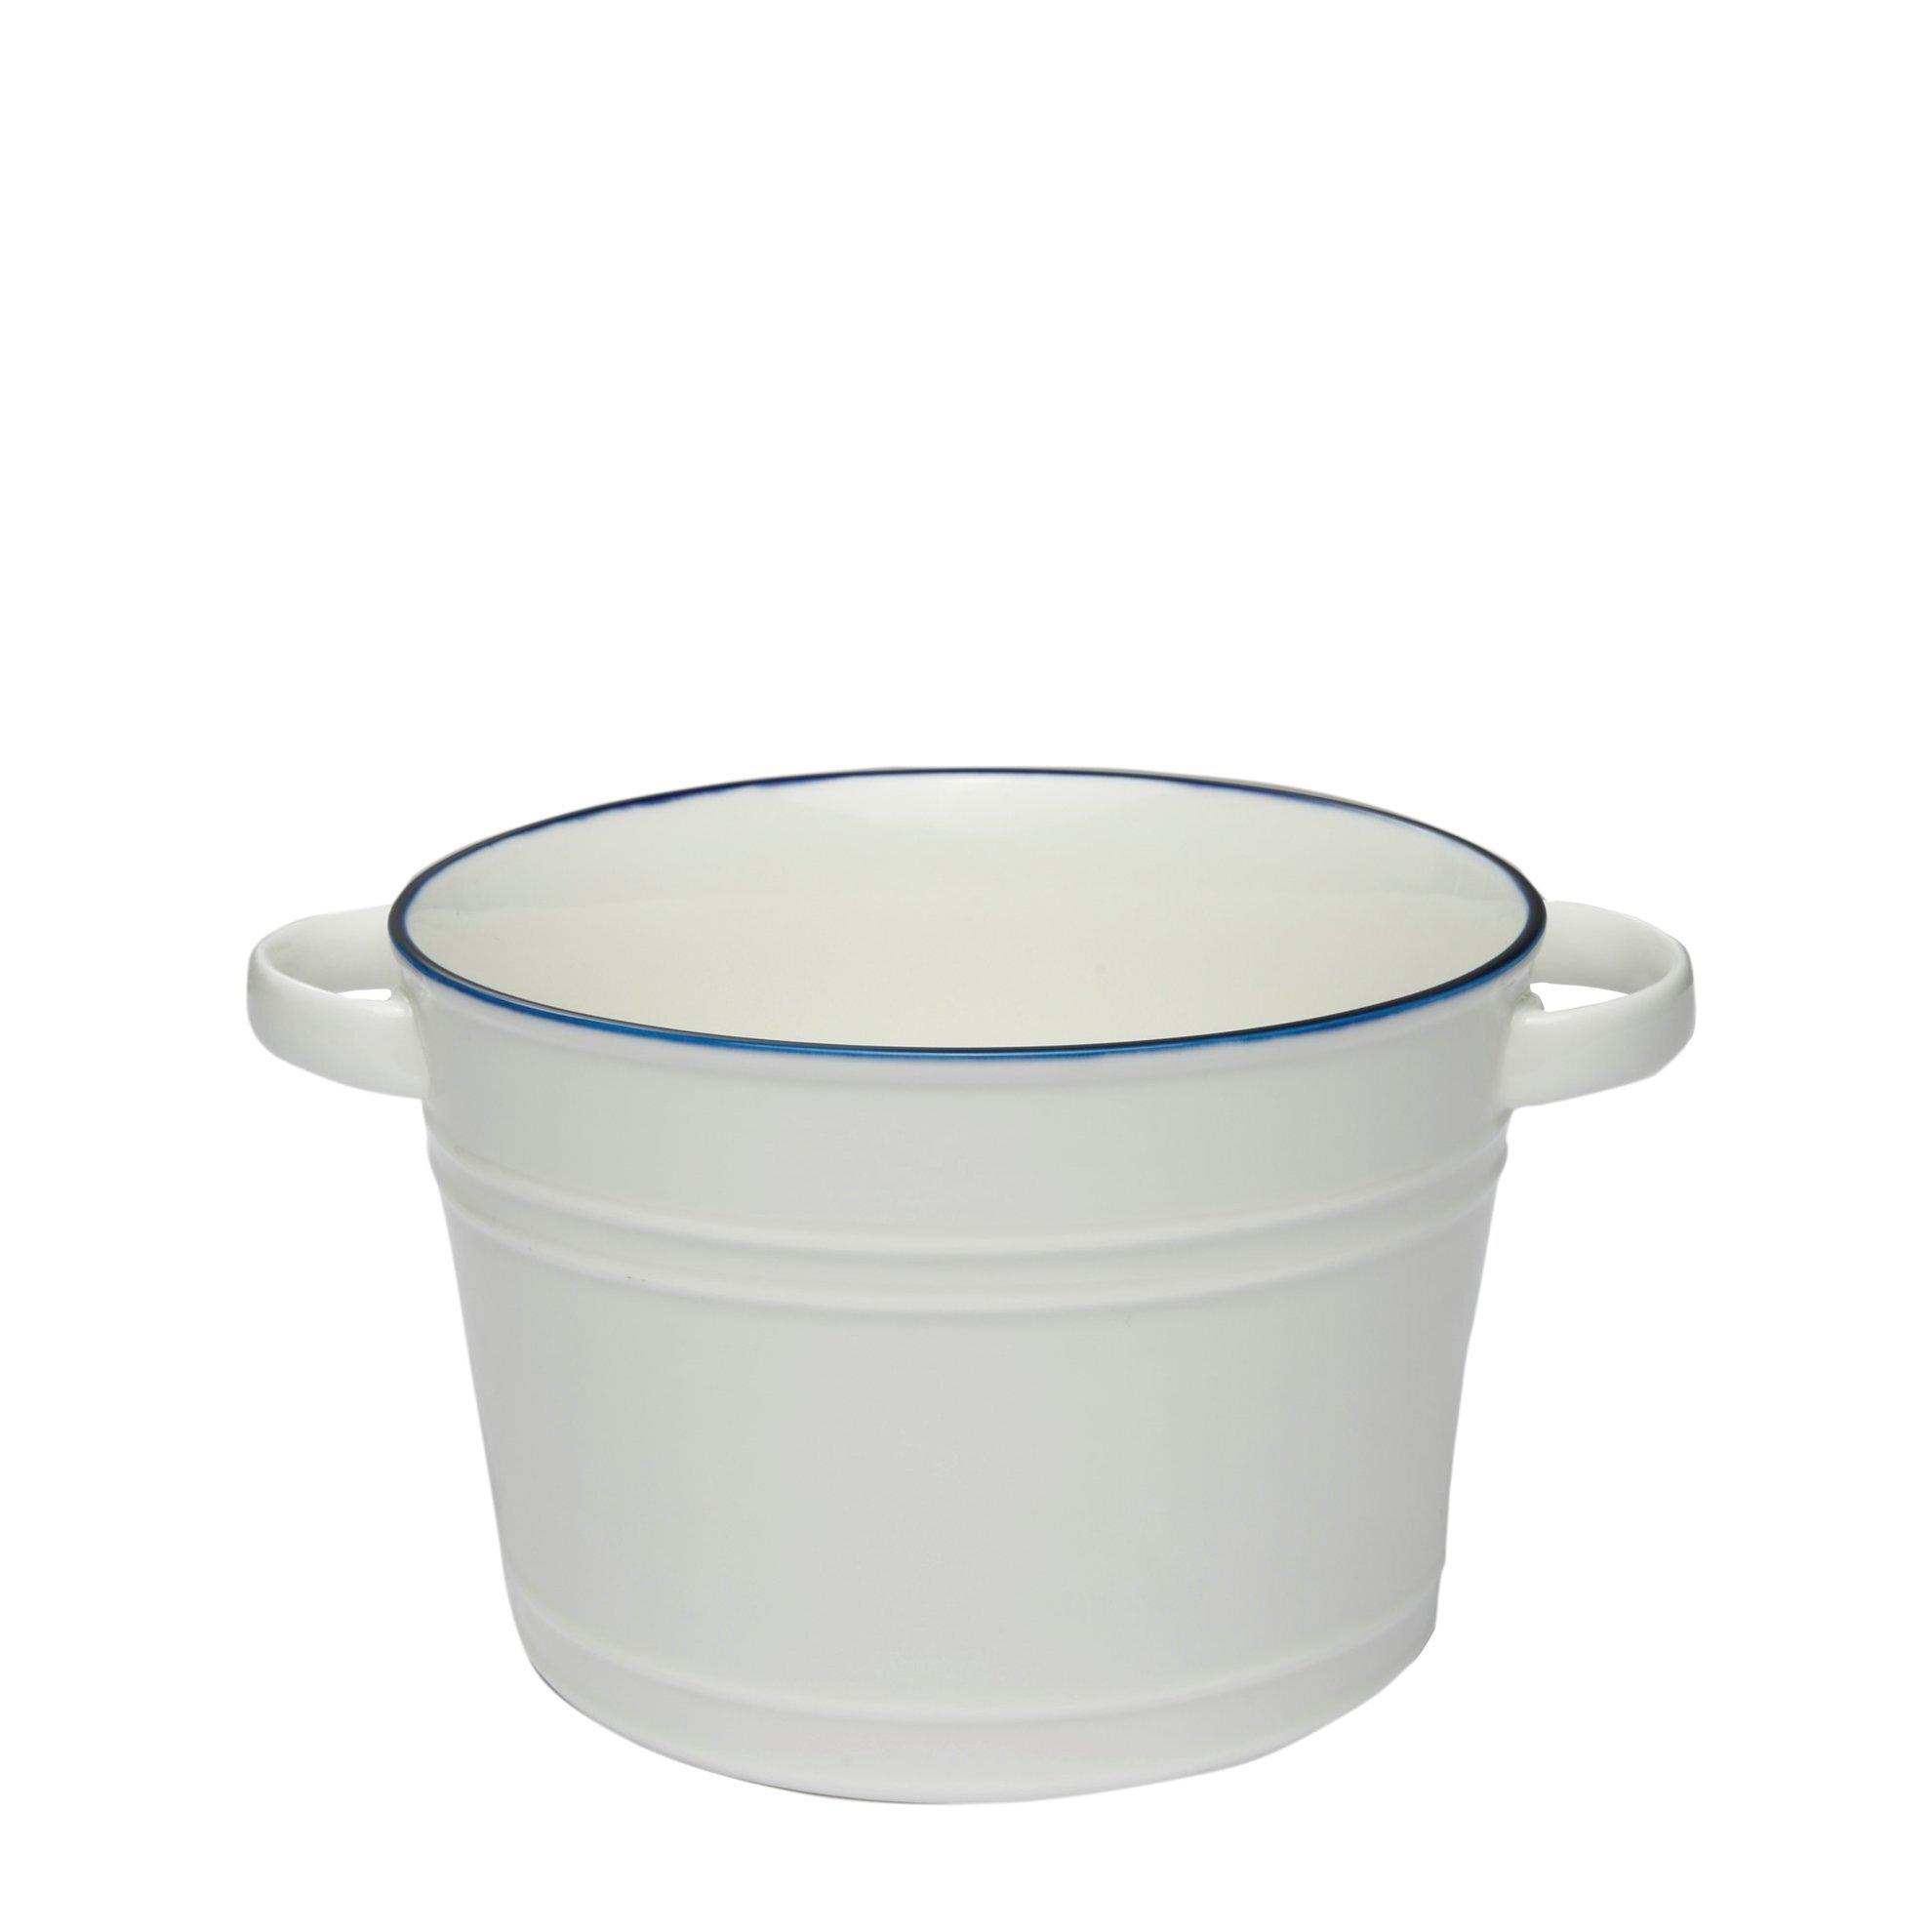 Porselen Süzgeç (27,5x21,5x14,5cm)